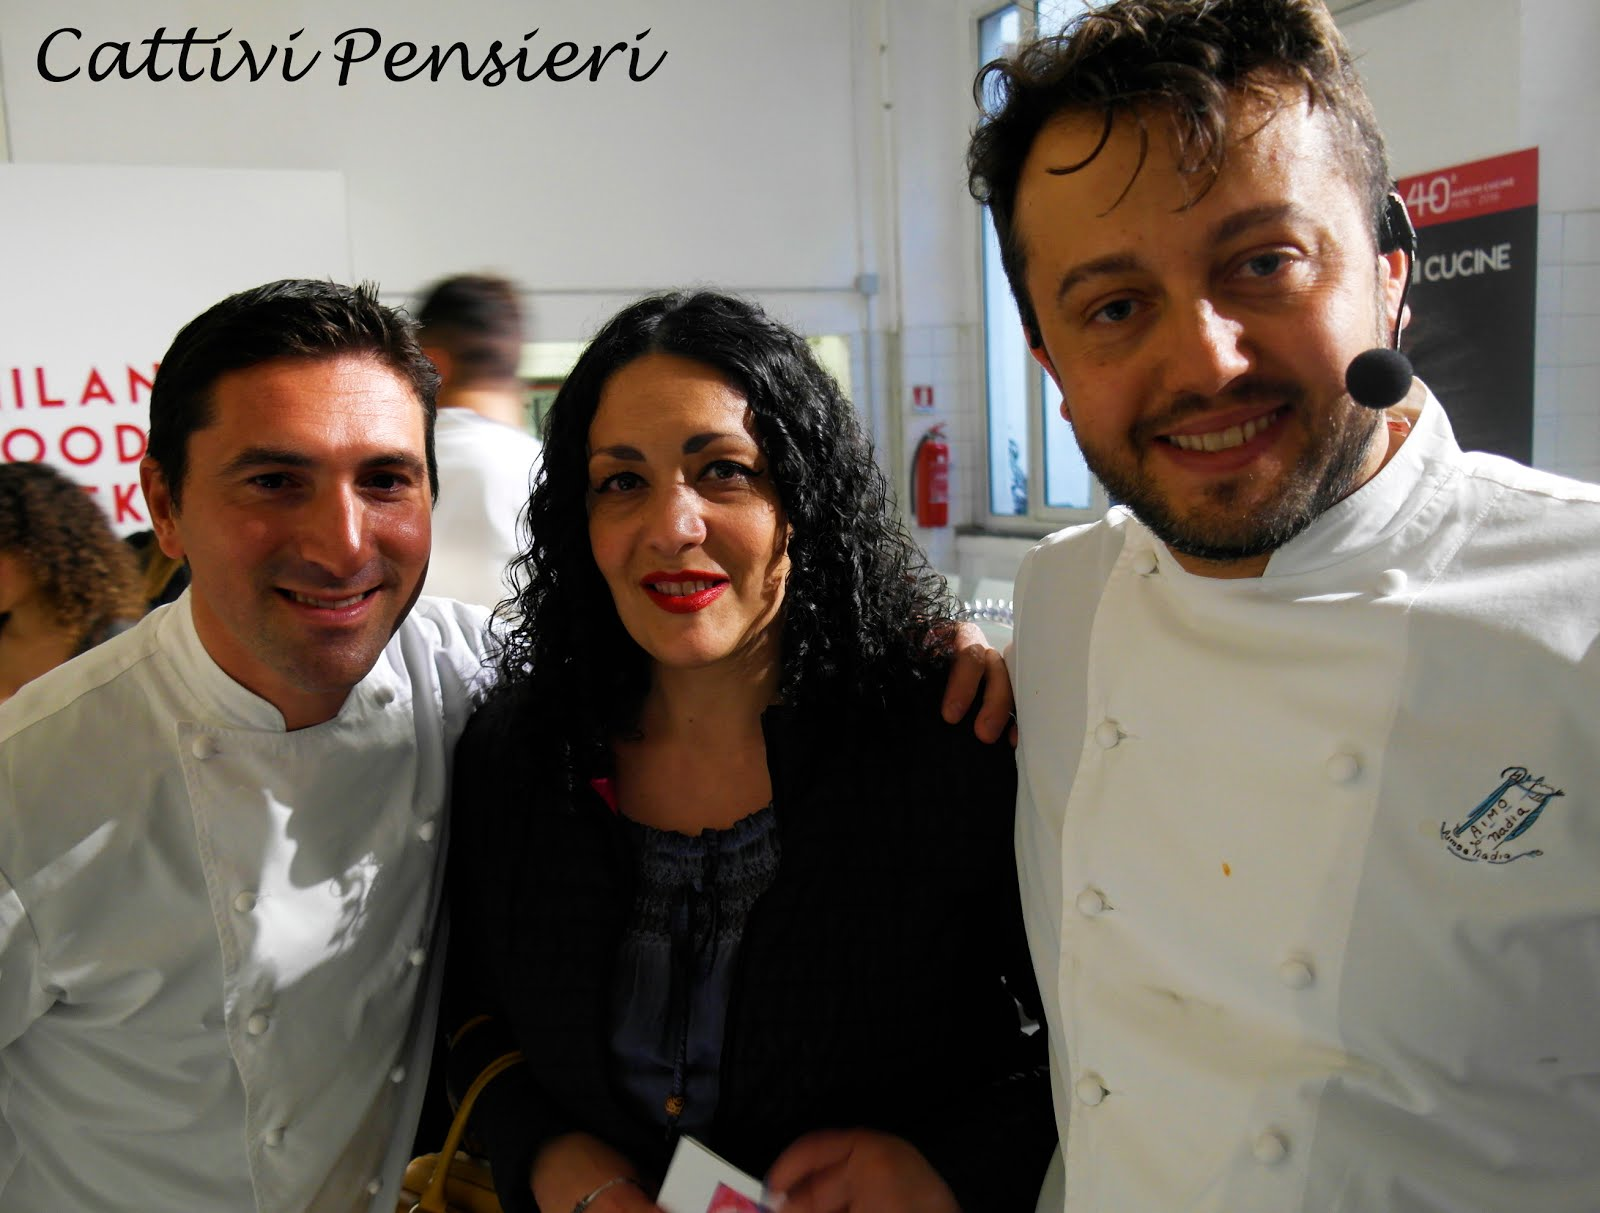 STORYCOOKING ALESSANDRO NEGRINI E FABIO PISANI